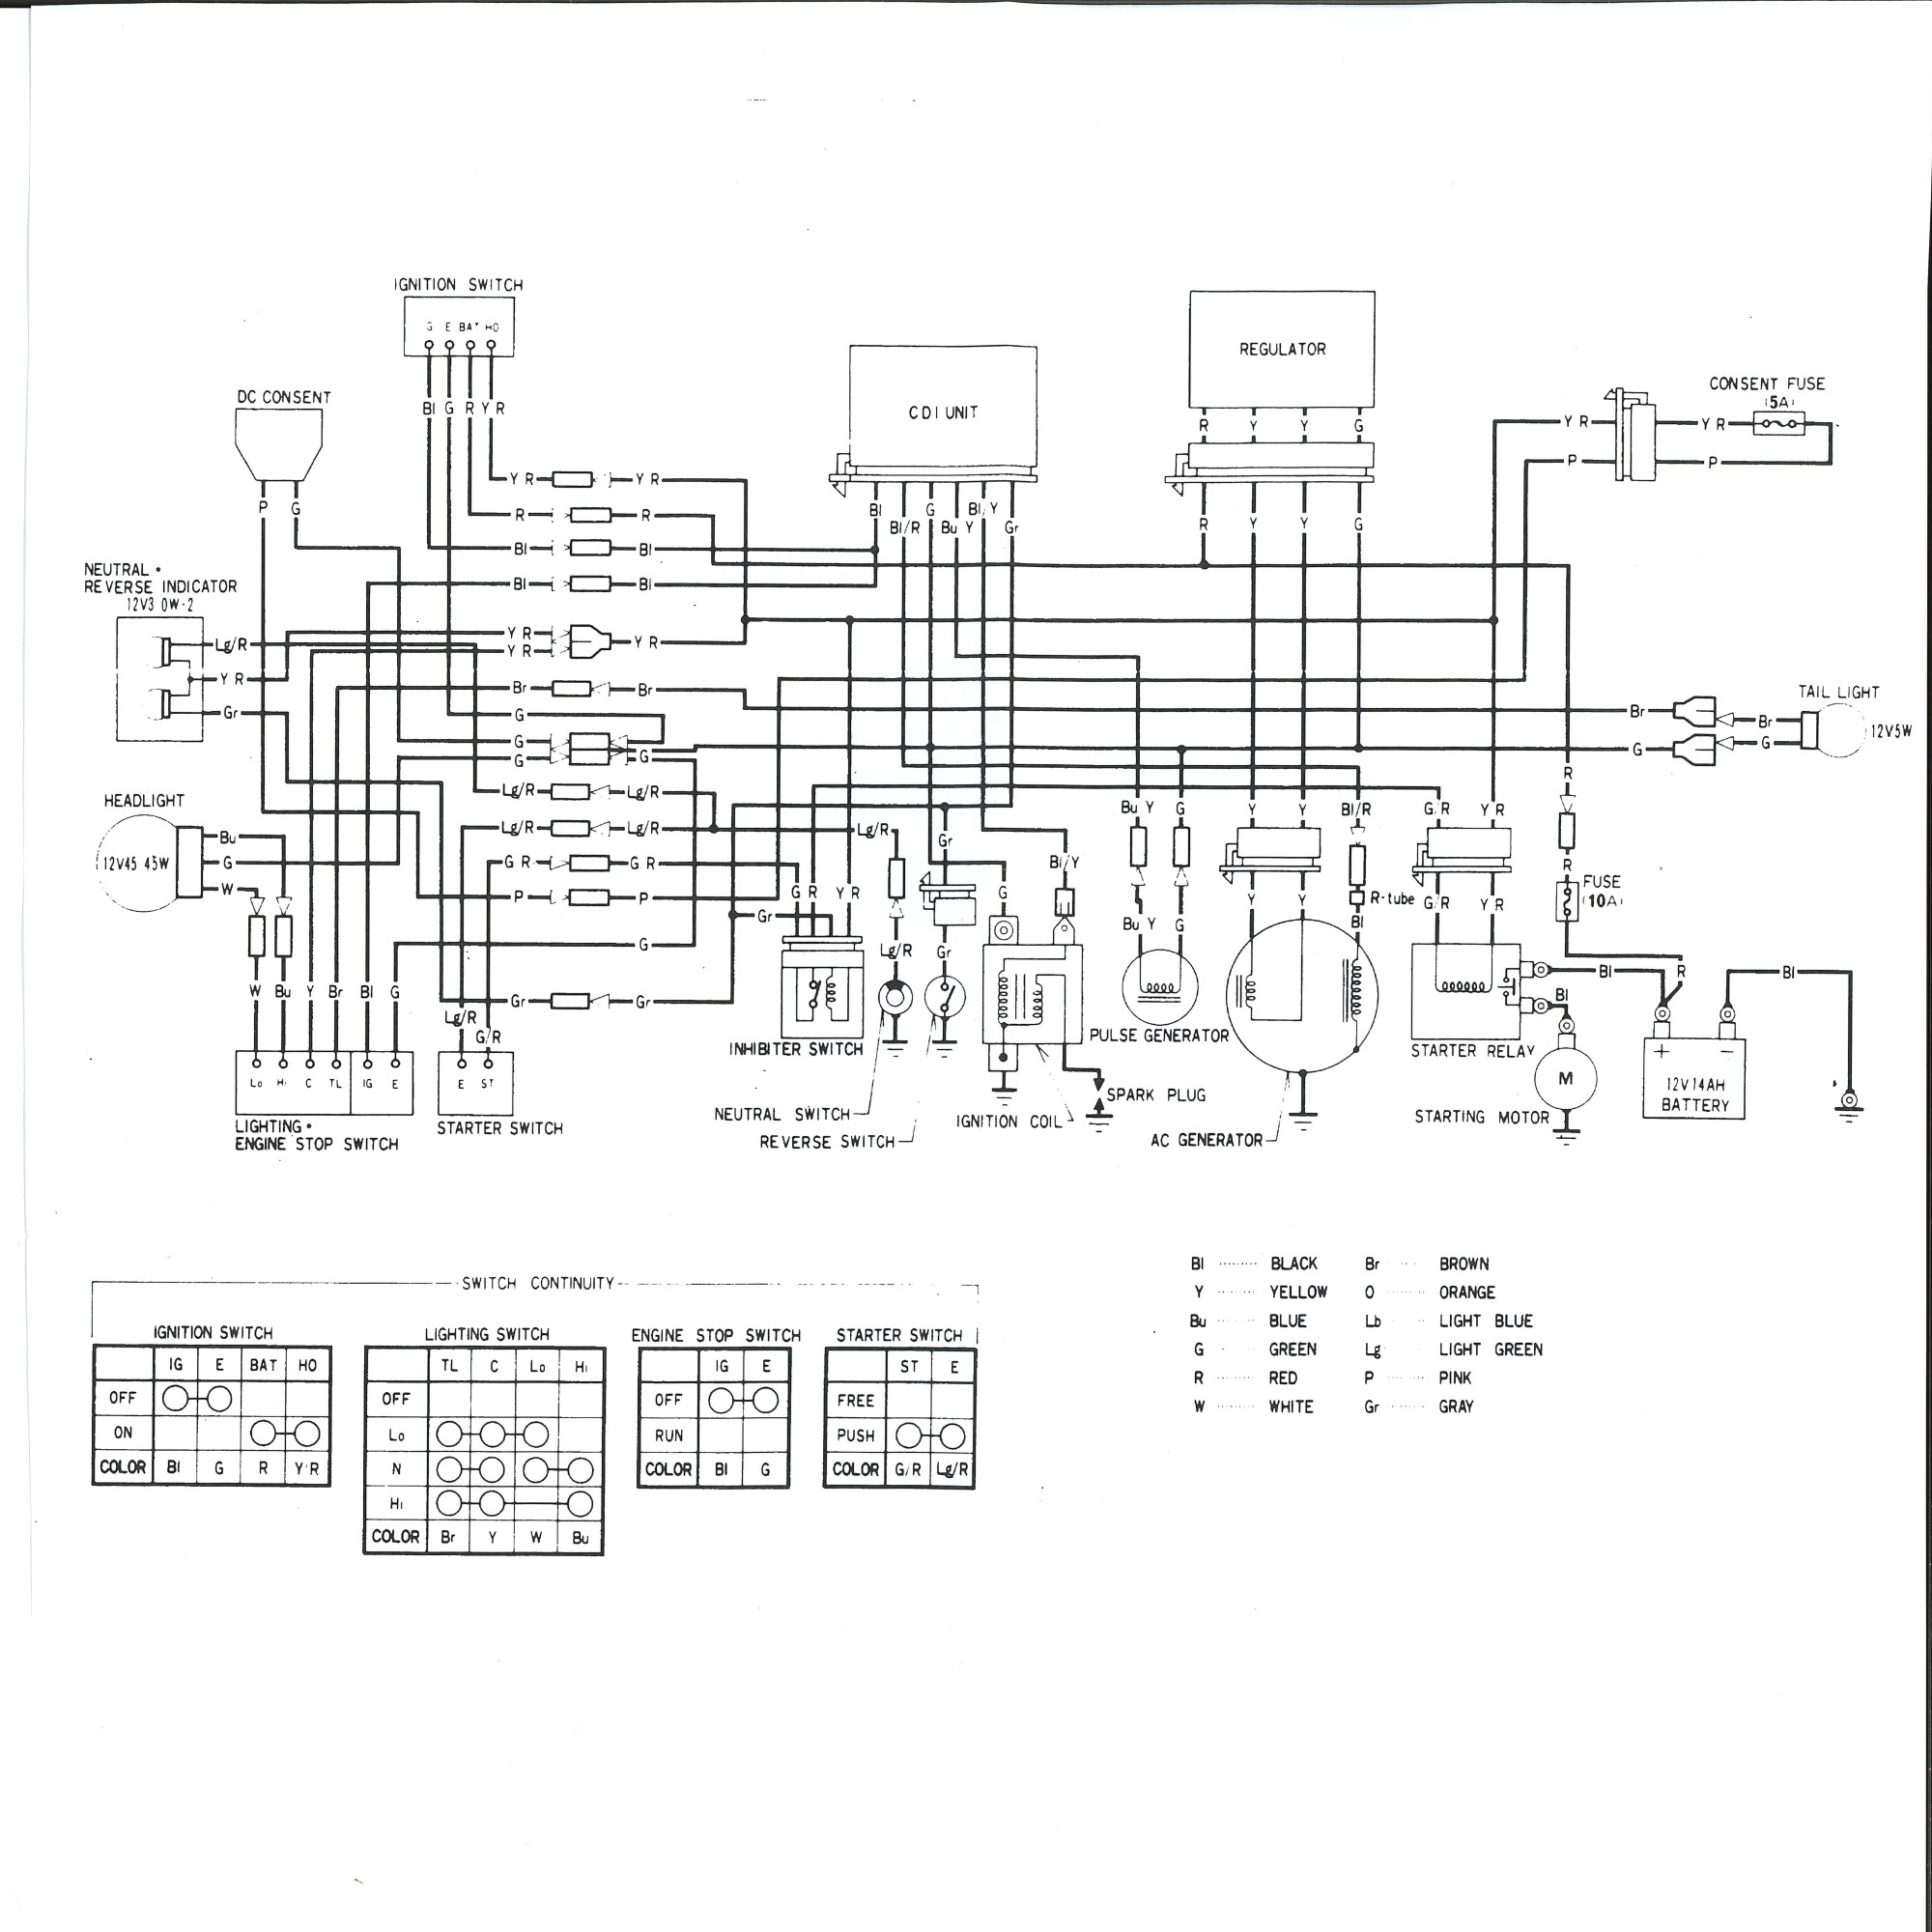 hight resolution of 1983 honda big red wiring diagram trusted wiring diagrams honda xl 250 wiring diagram 1983 honda